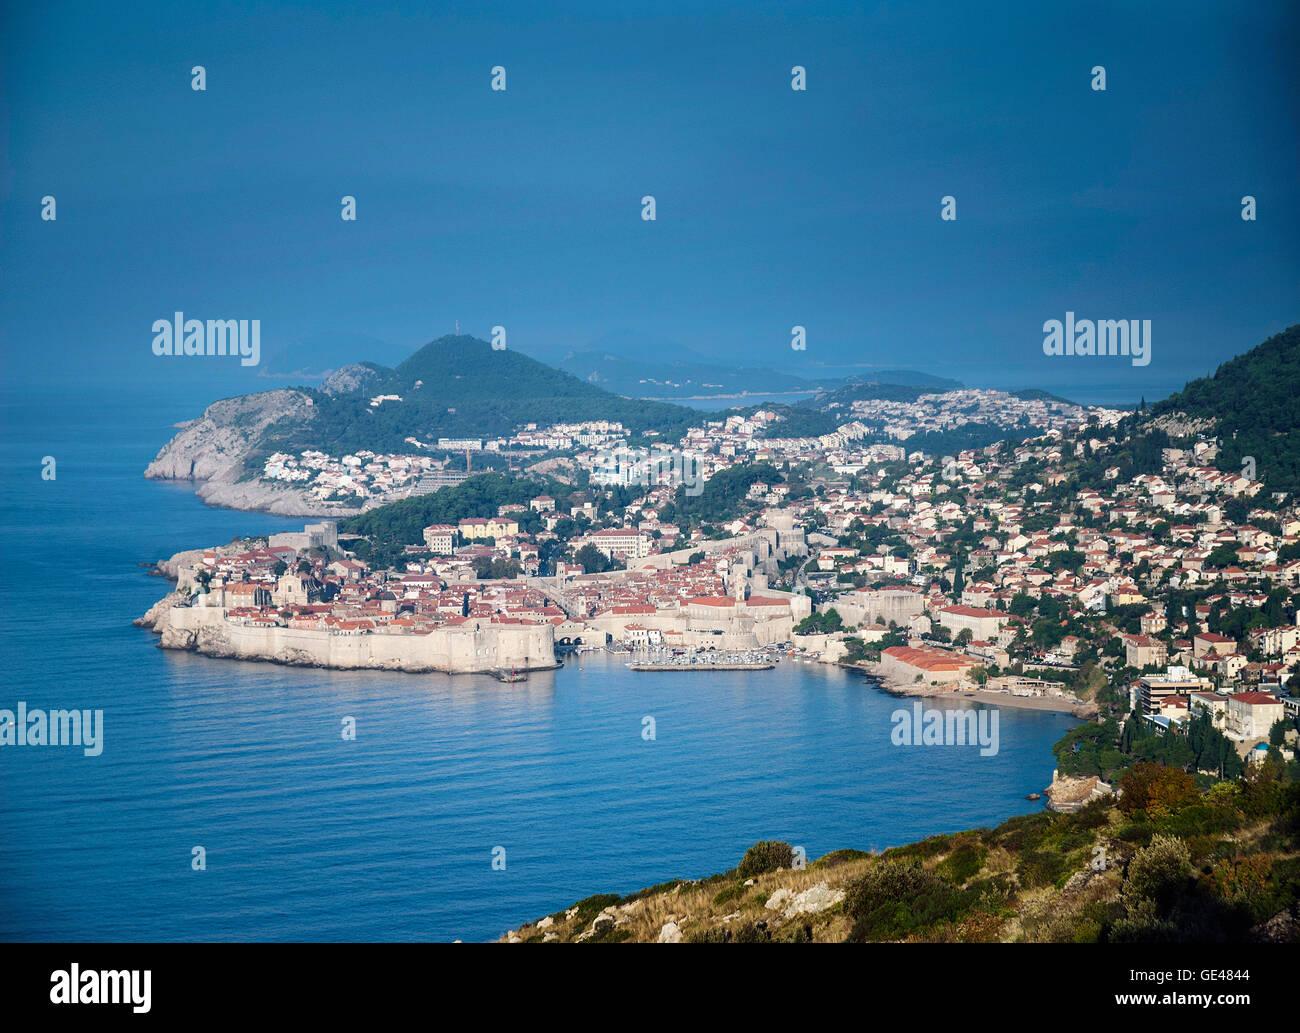 dubrovnik old town view and adriatic coast in croatia balkans - Stock Image